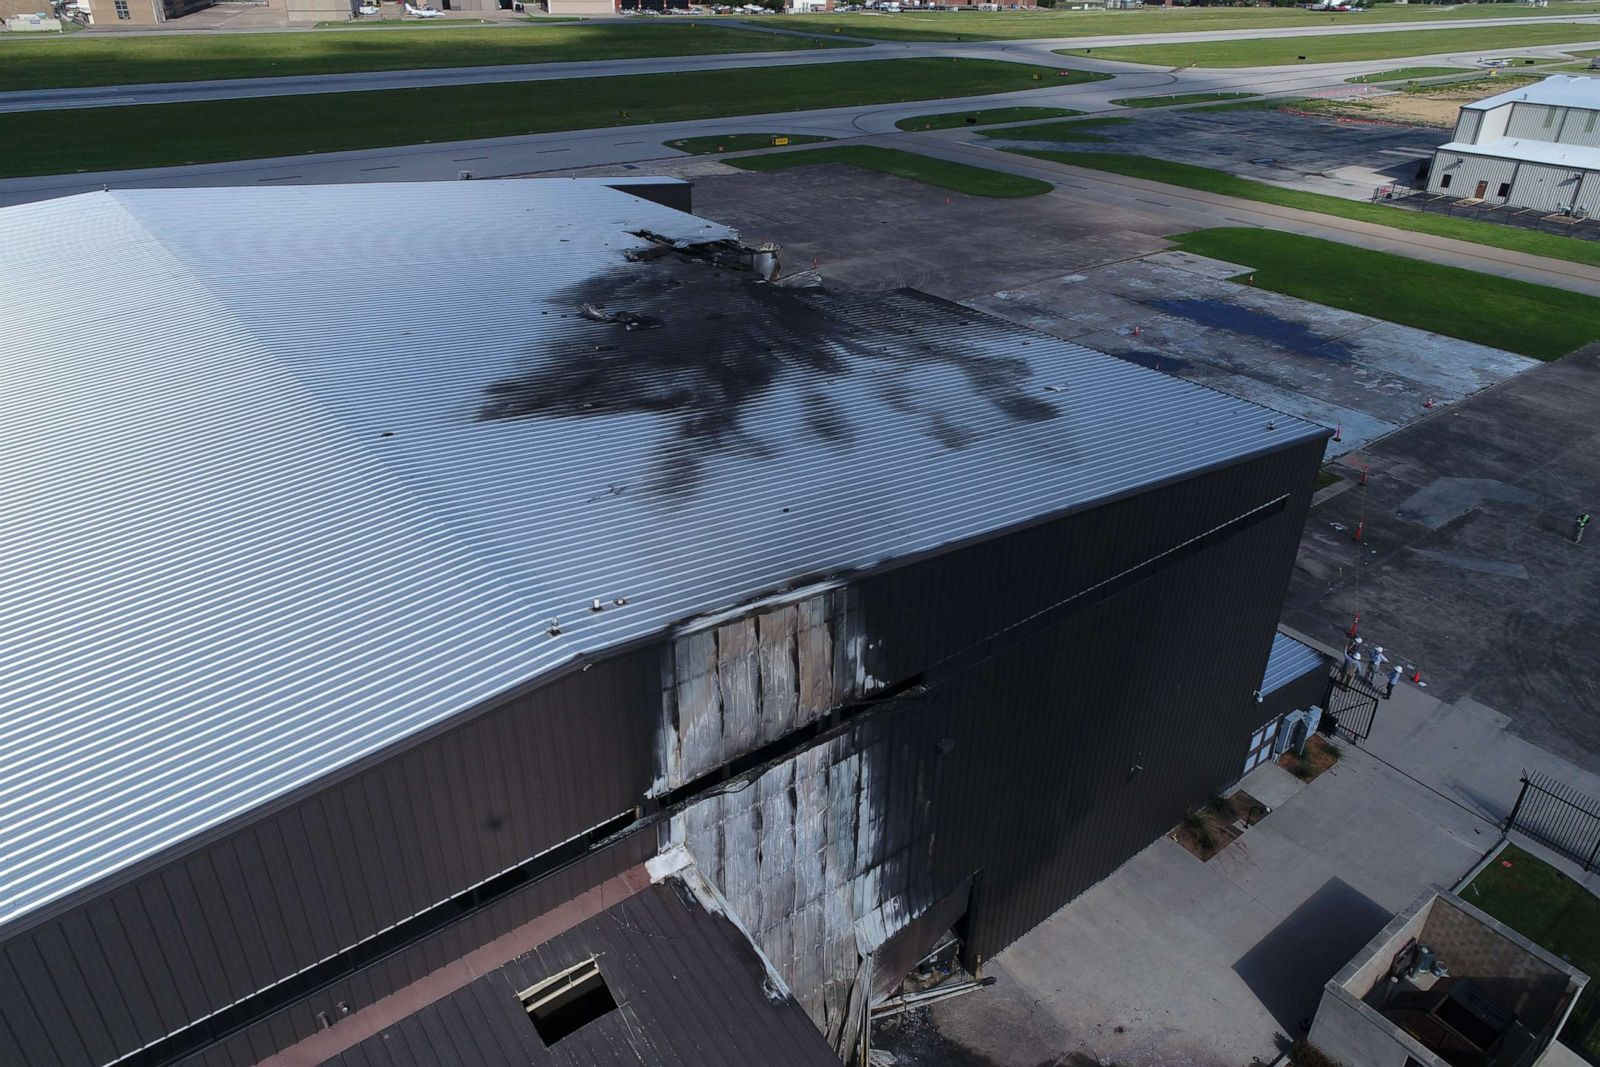 Family of 4 among 10 killed in fiery plane crash near Dallas